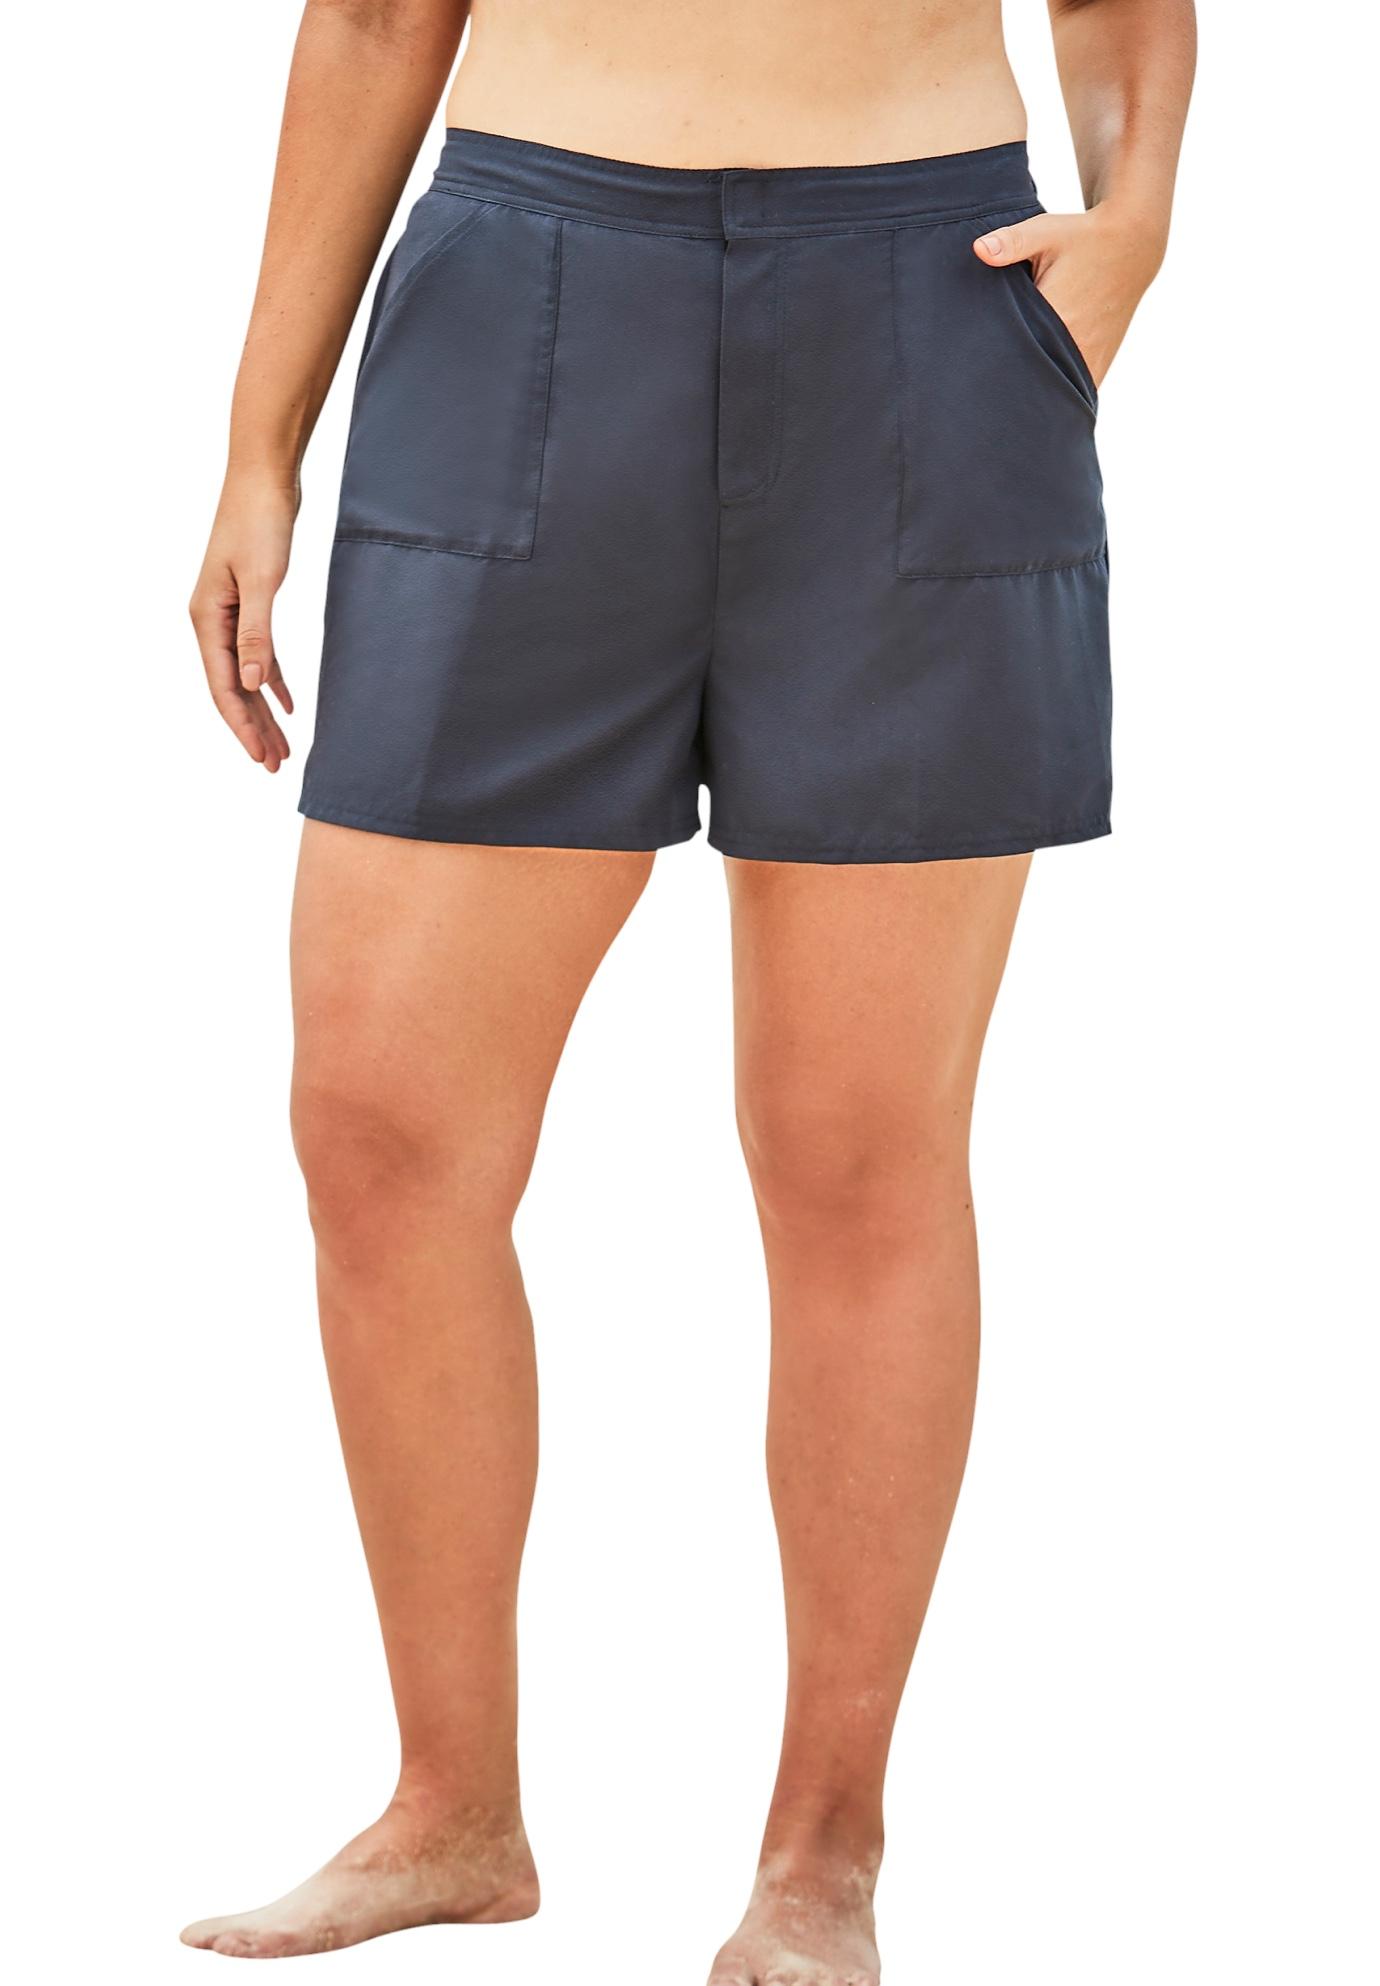 Plus Size Women's Cargo Swim Shorts with Side Slits by Swim 365 in Navy